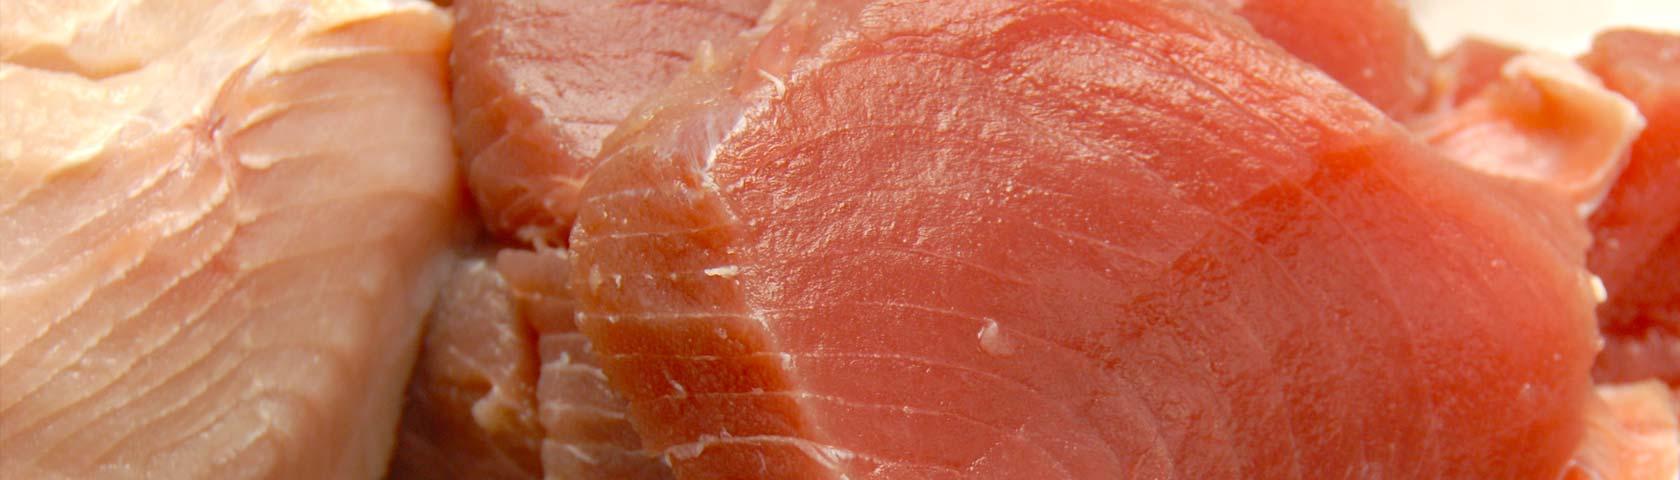 Edgar Madsen - altif frisk fisk til restauranter og storkøkkener